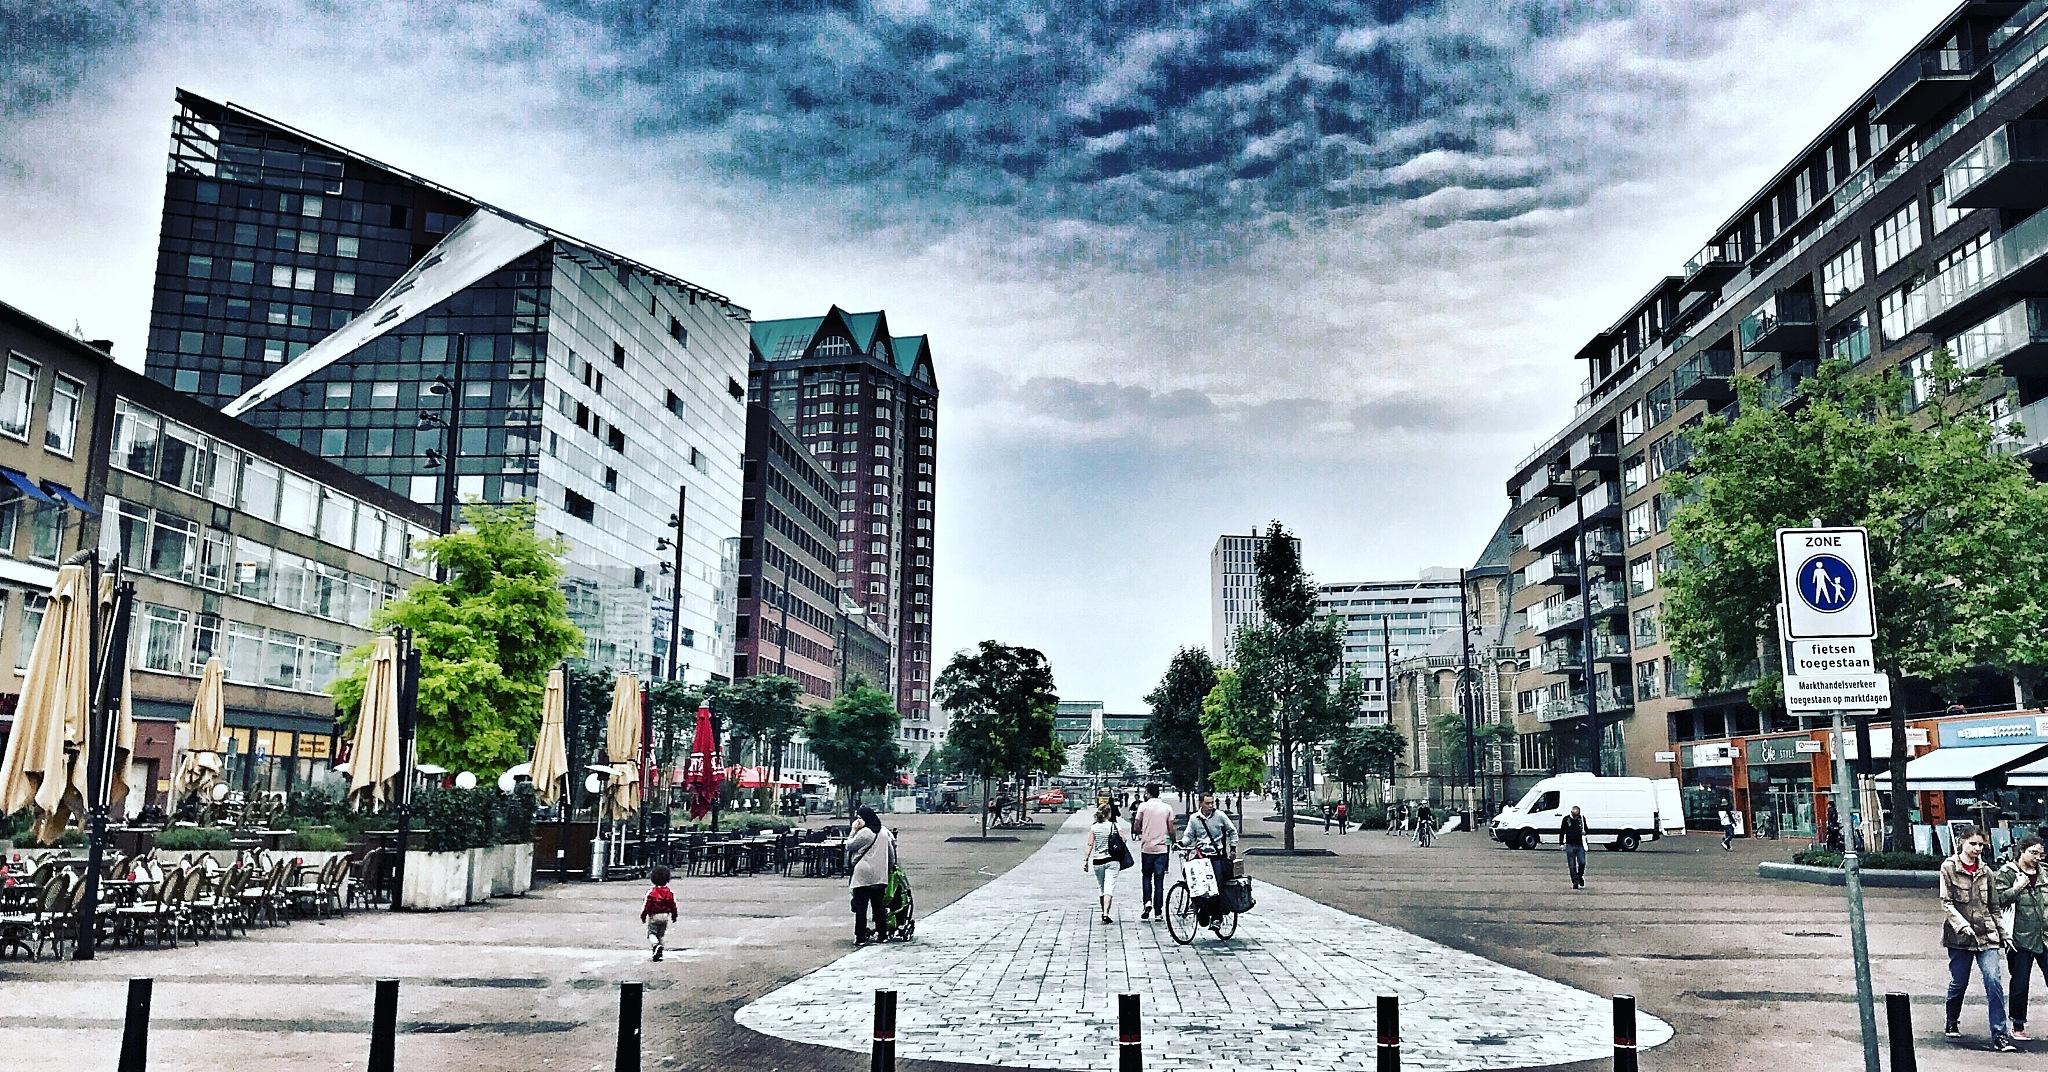 CityscapeRotterdam  by ad.kesteloo